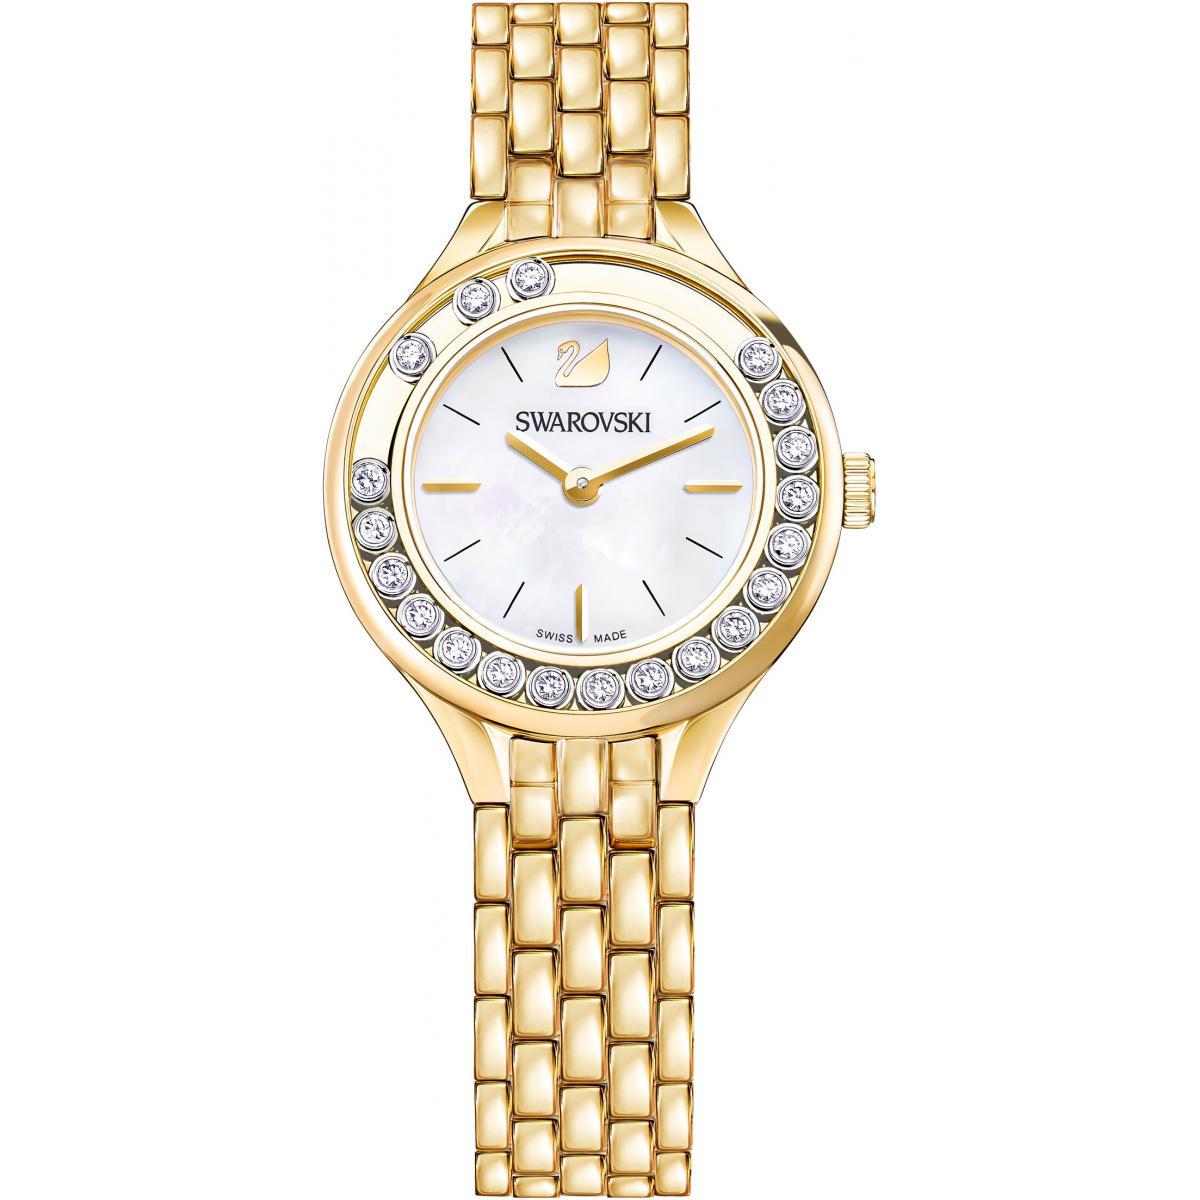 Montre Swarovski Lovely Crystals Mini 5242895 - Montre Acier - Swarovski montres - Modalova